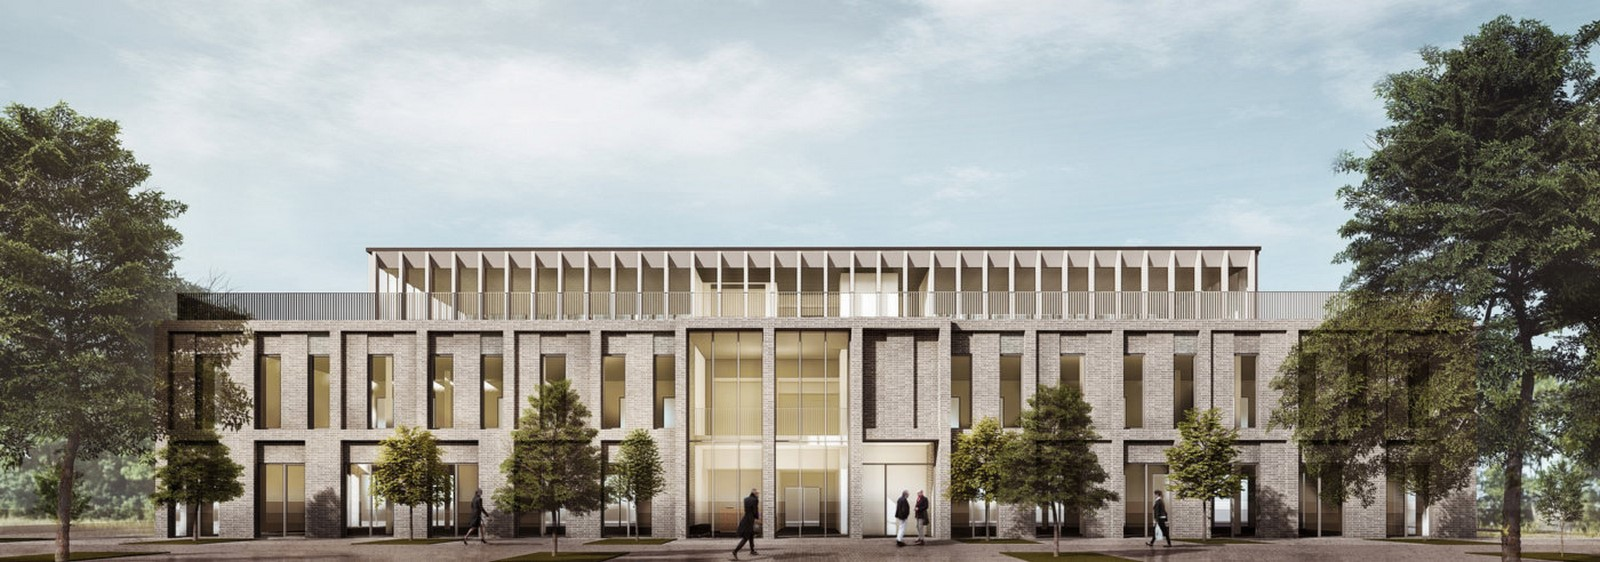 Architects in Oxford - Top 45 Architects in Oxford - Sheet28